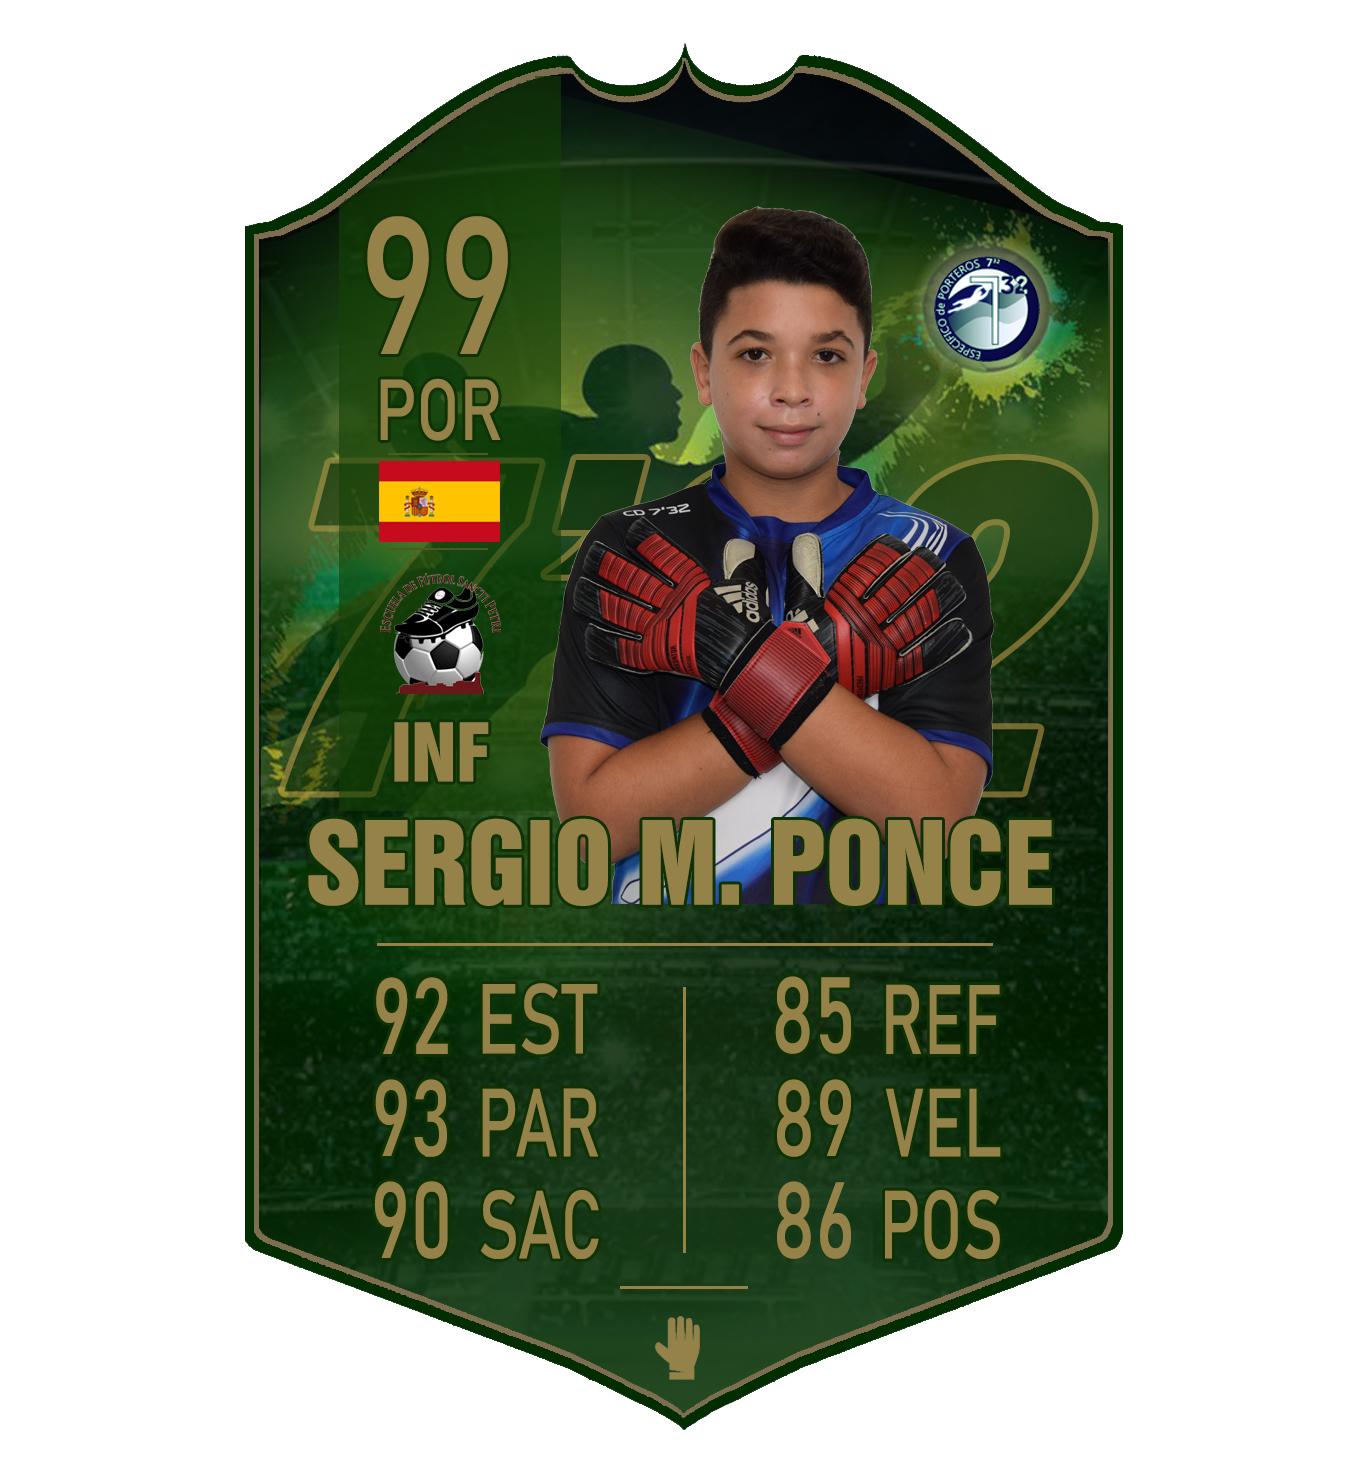 CLUB: Escuela de Fútbol Santi Petri